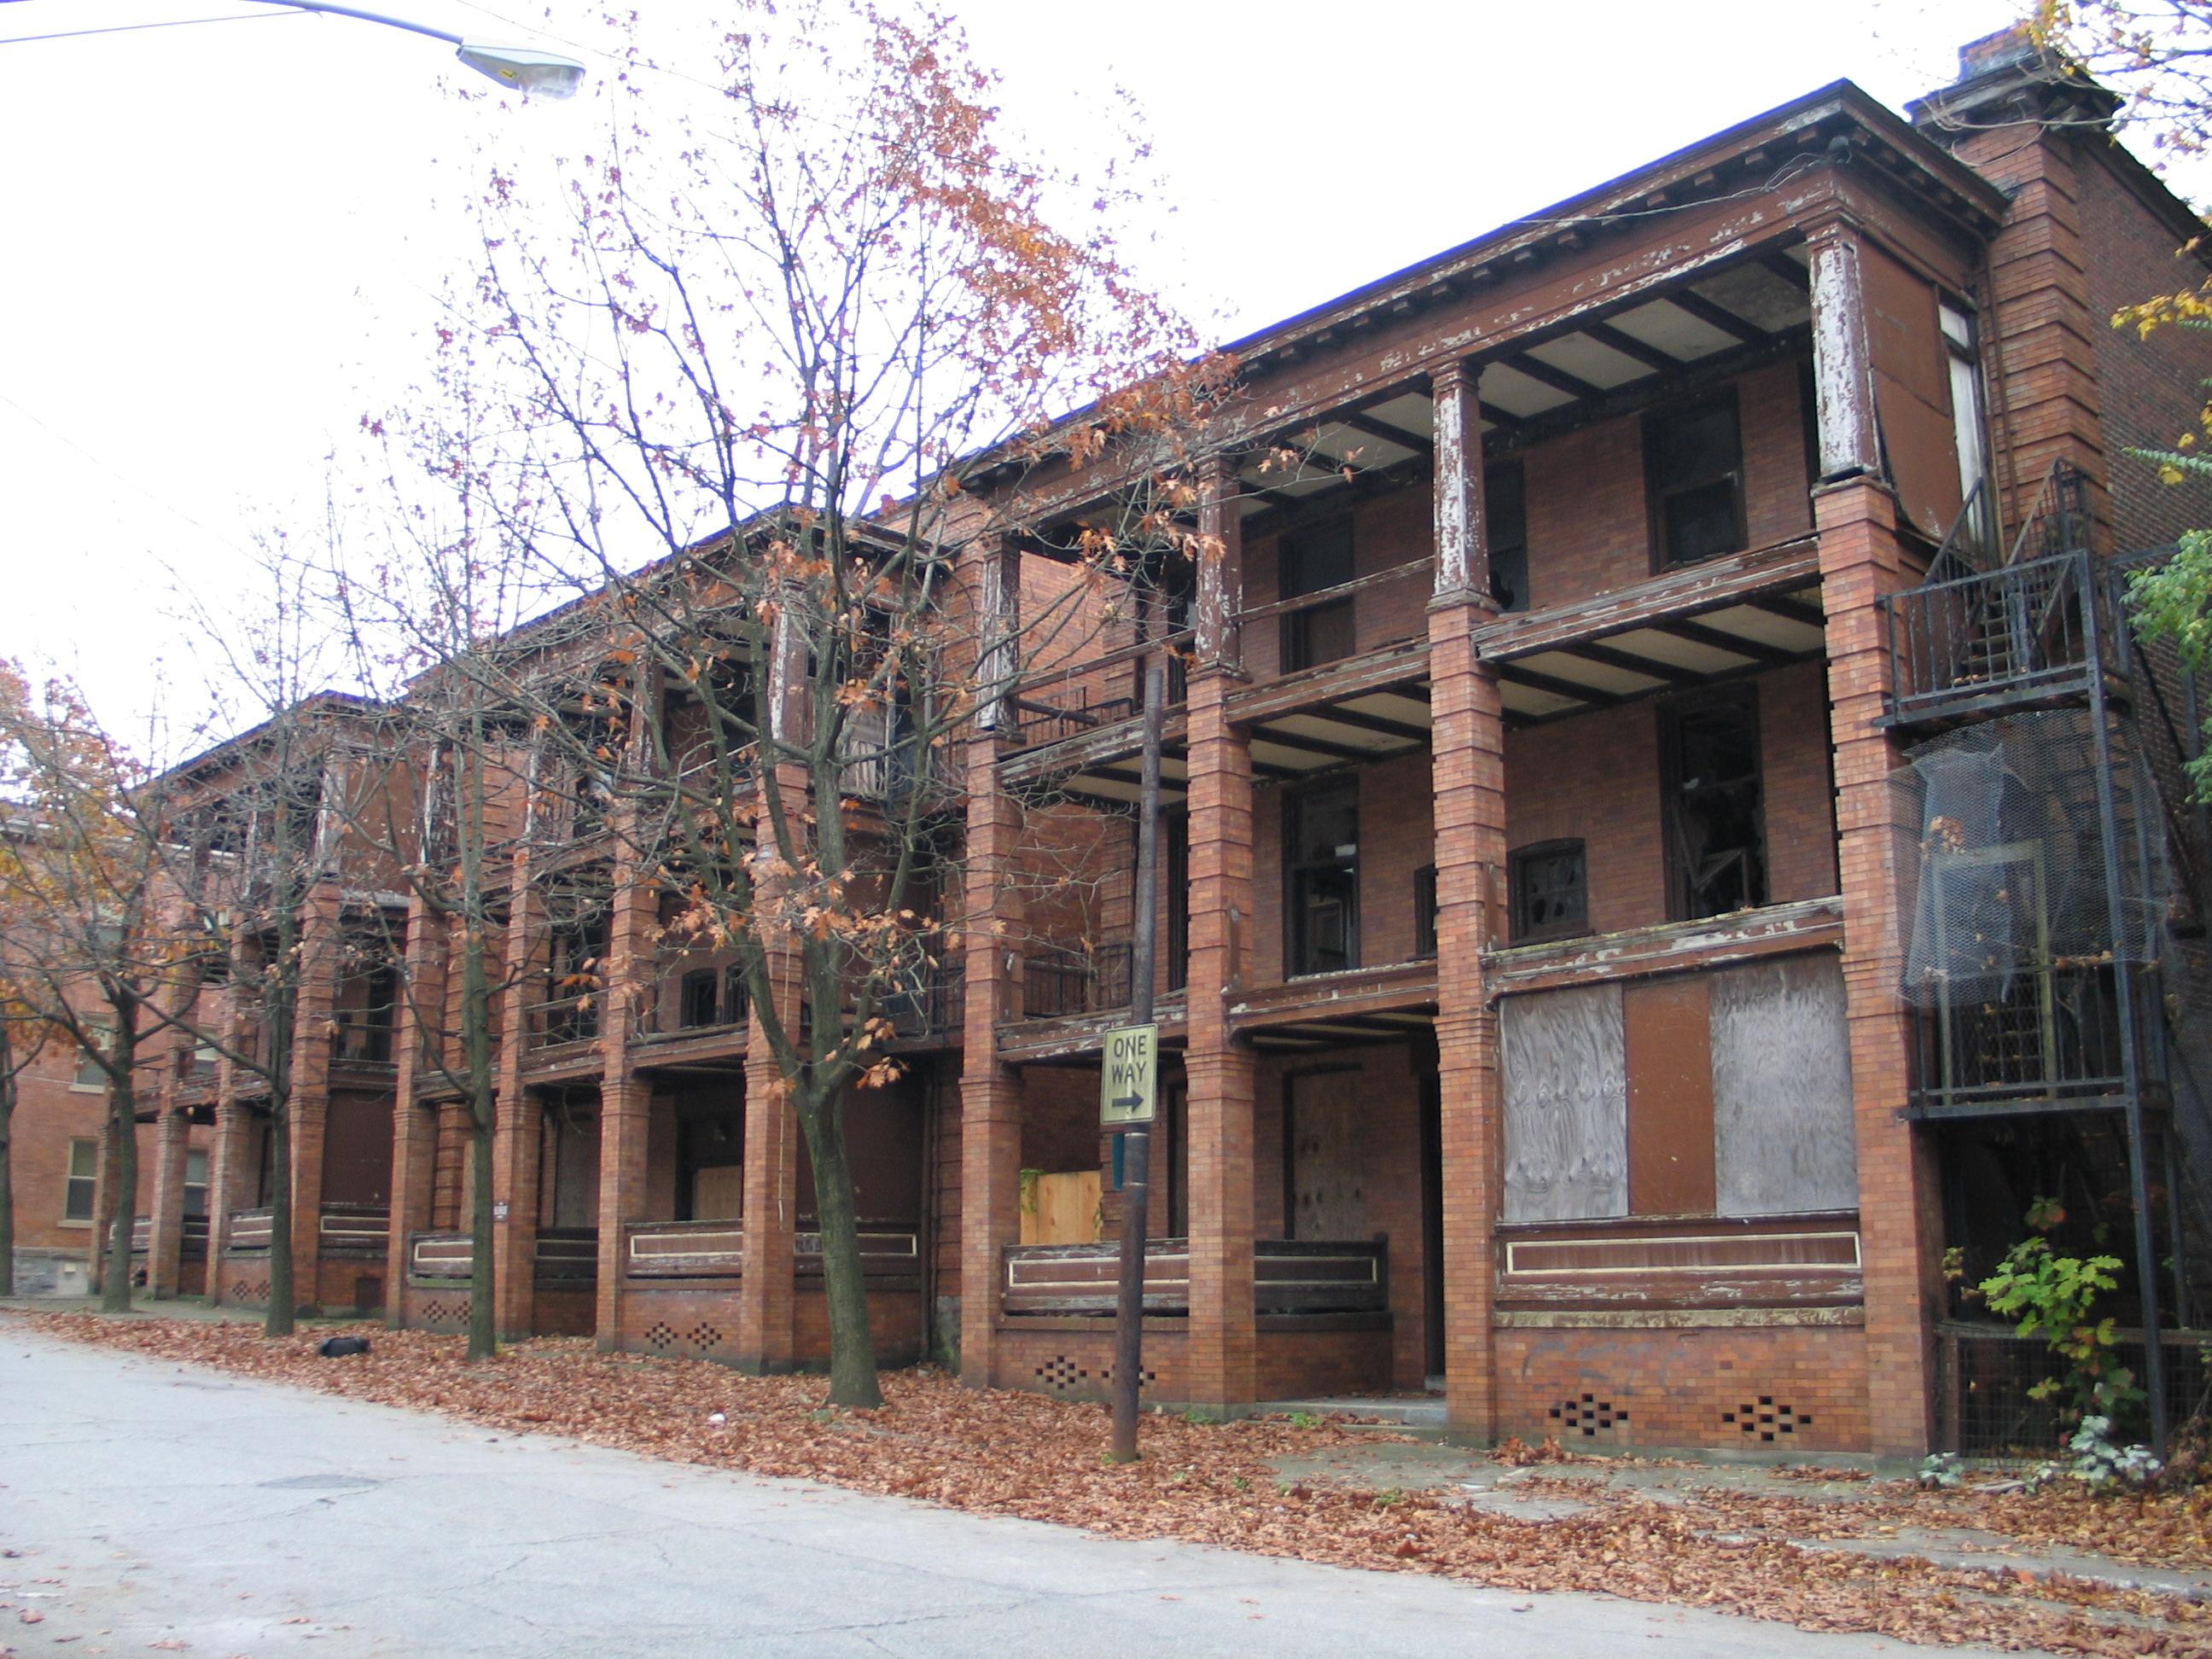 Falconhurst Apartments Exterior Before